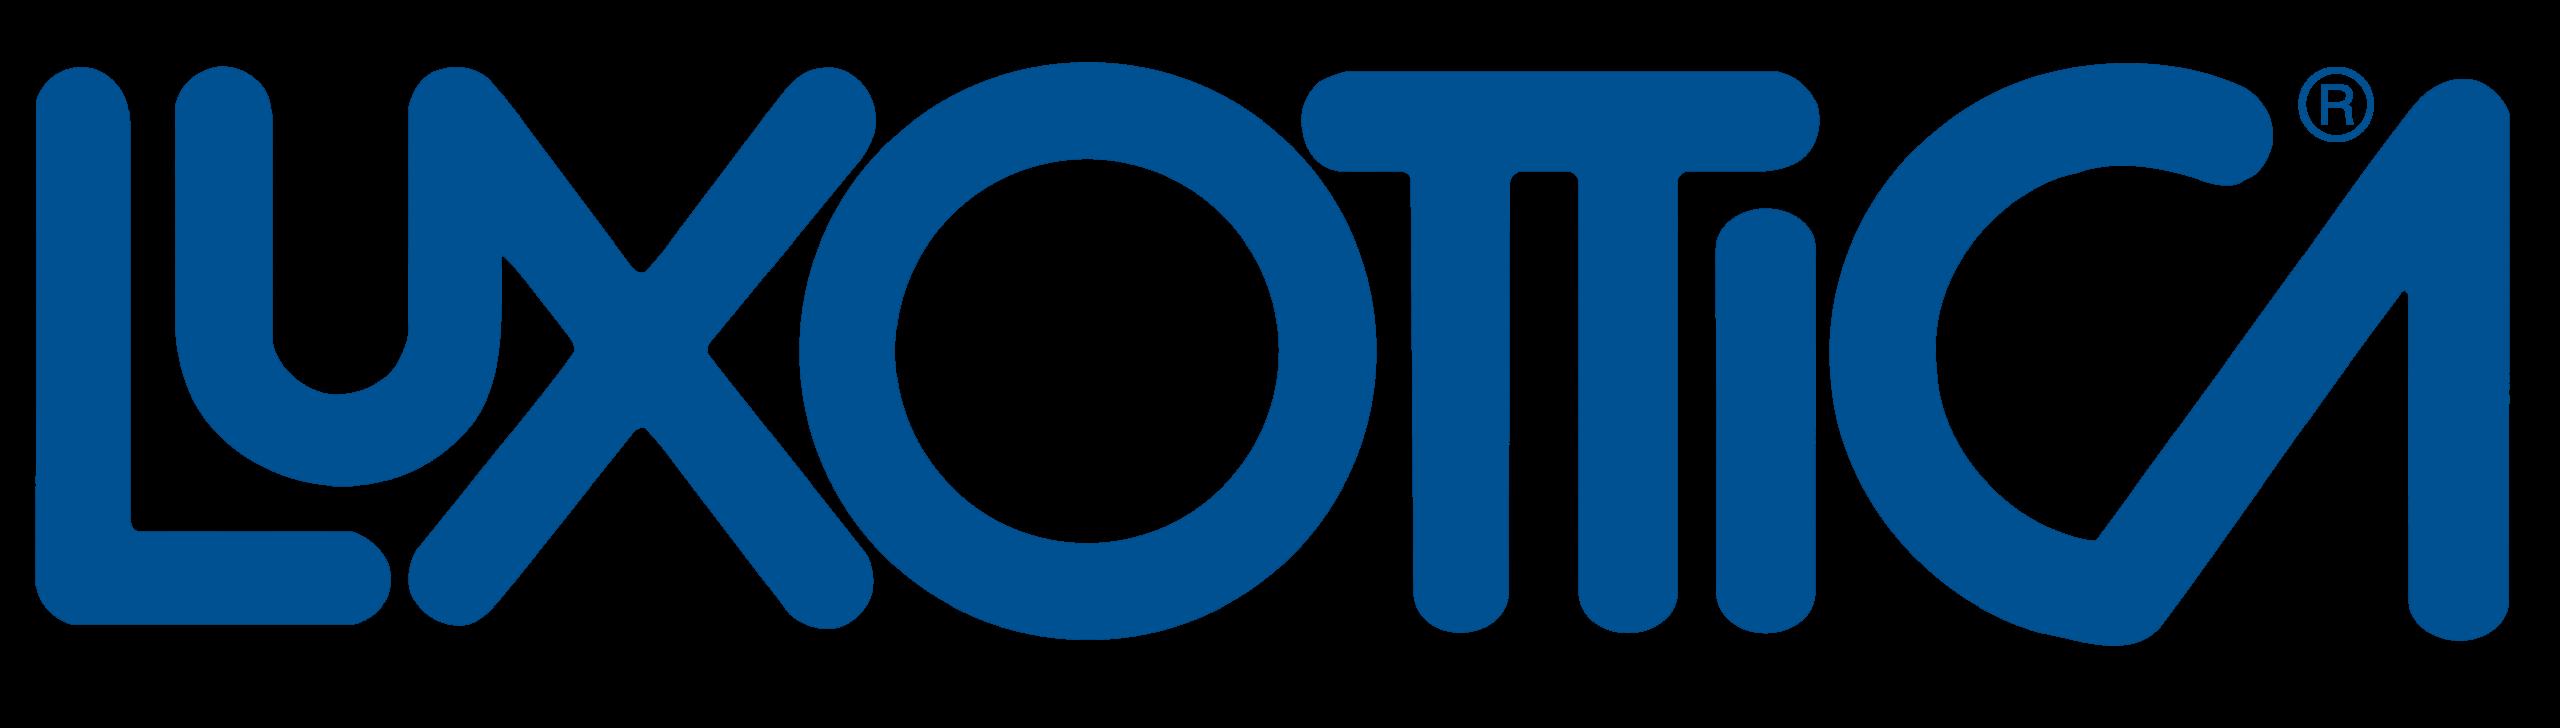 Luxottica_logo_AUG20